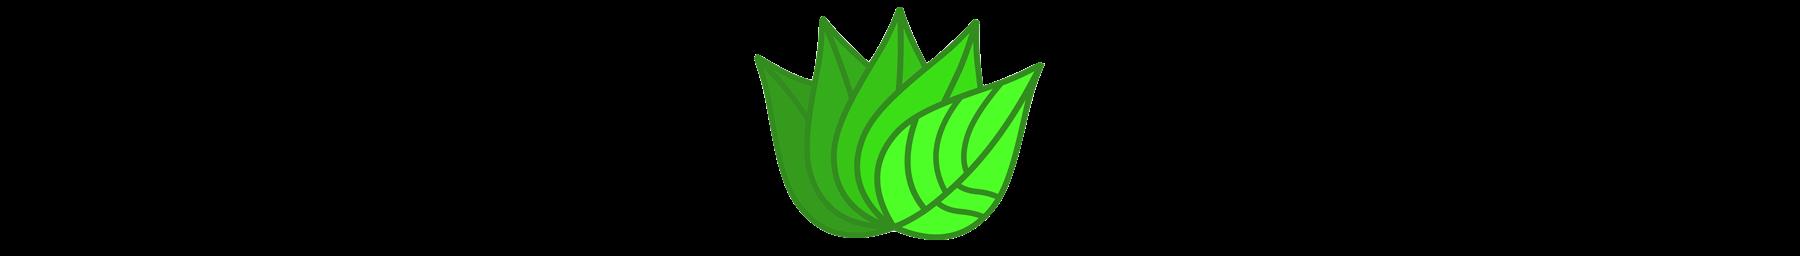 0_5 Leaf long.png